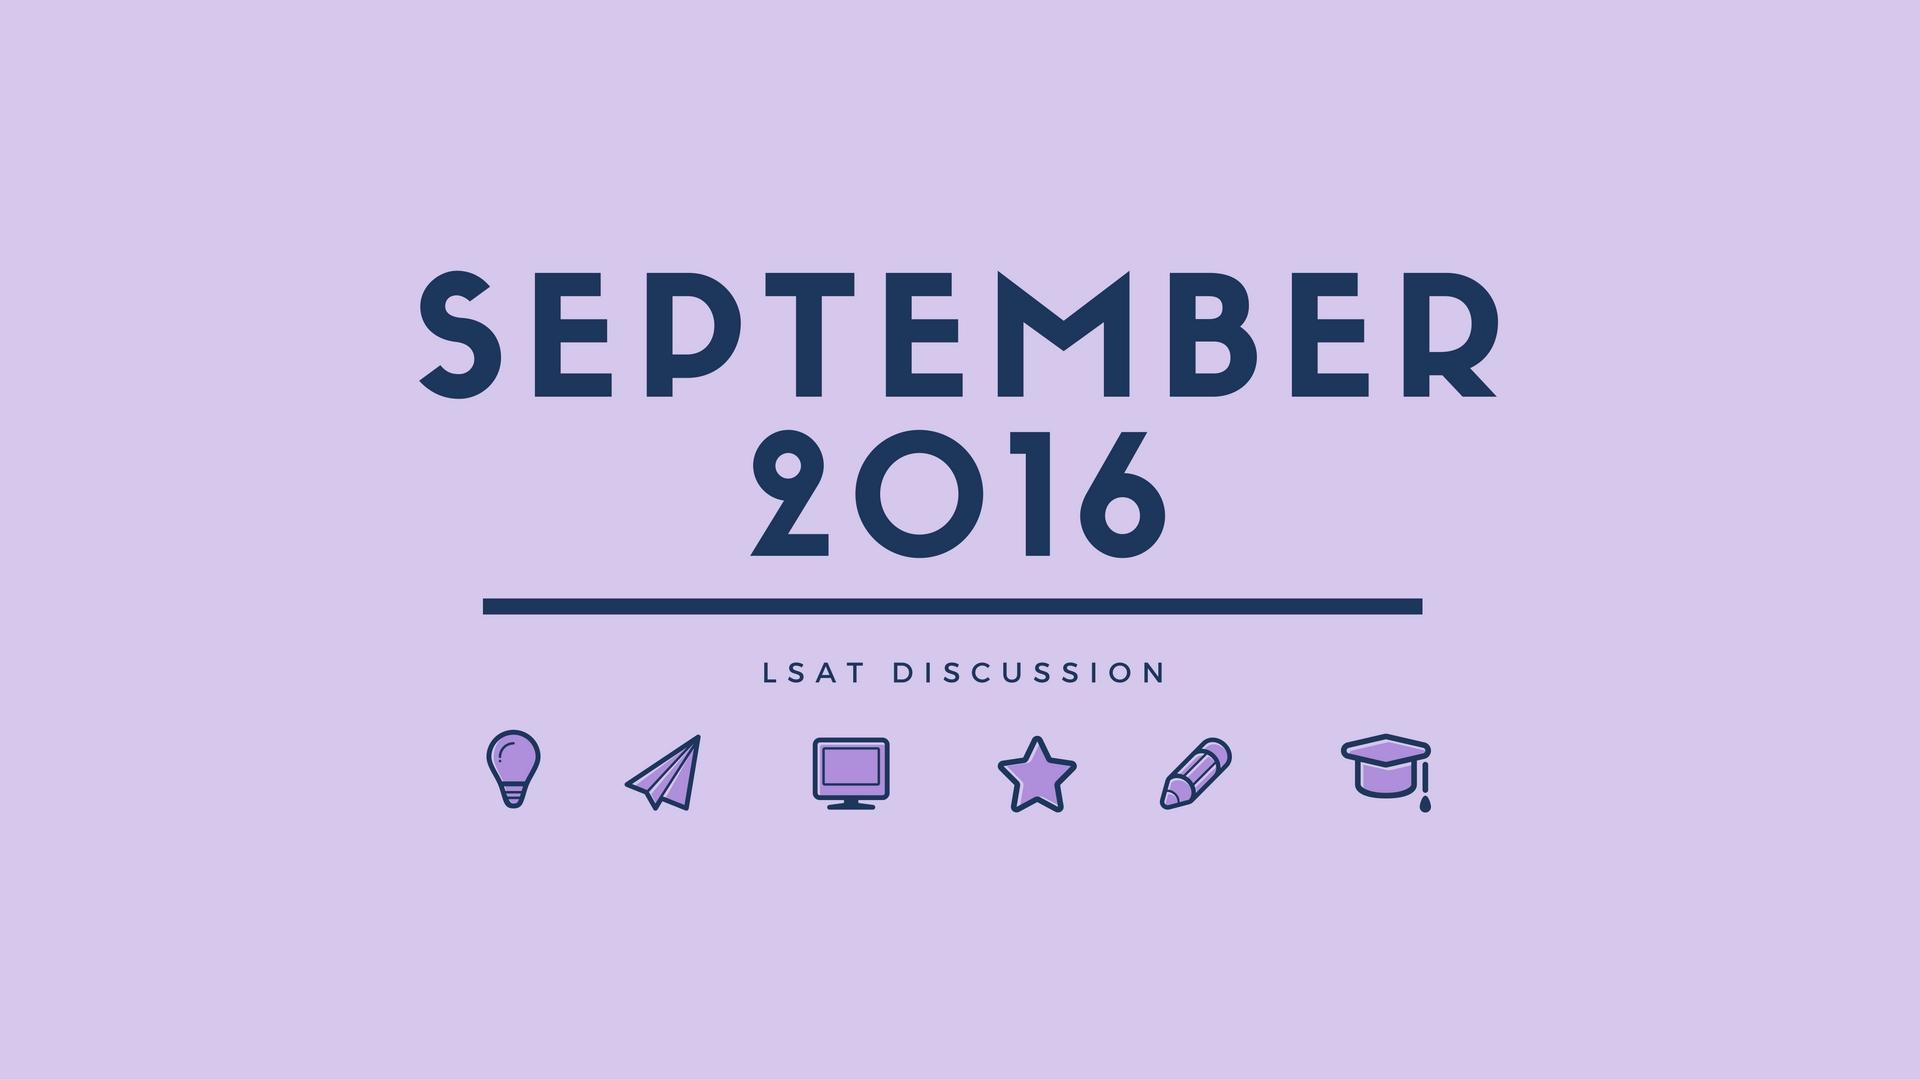 law school application deadlines for fall 2017